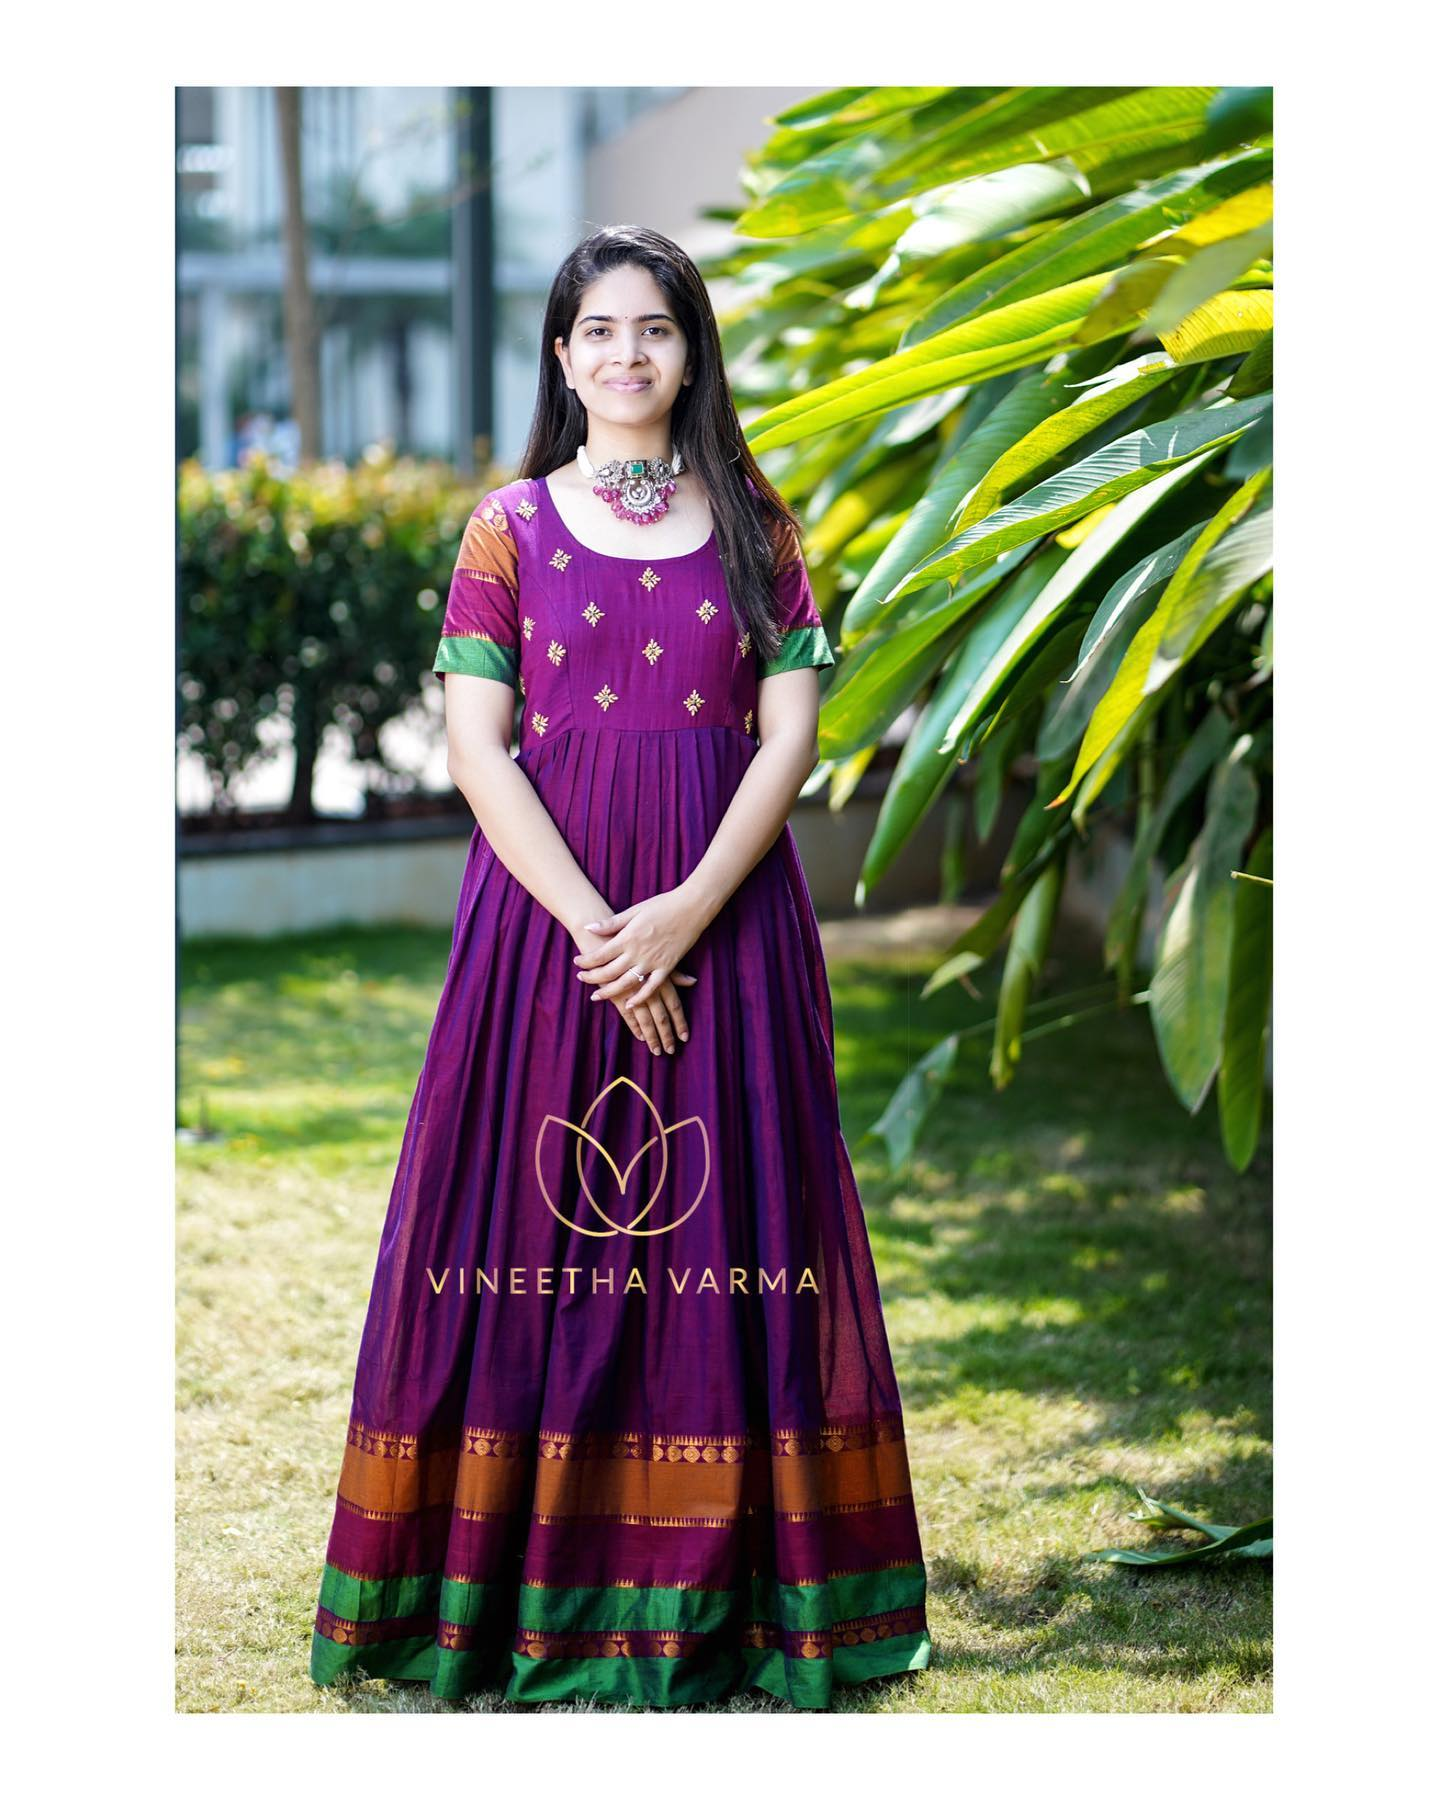 Beautiful purple Handloom maxi. Jewellery : Petals by swathi. Pc : My snap tales. 2021-04-08